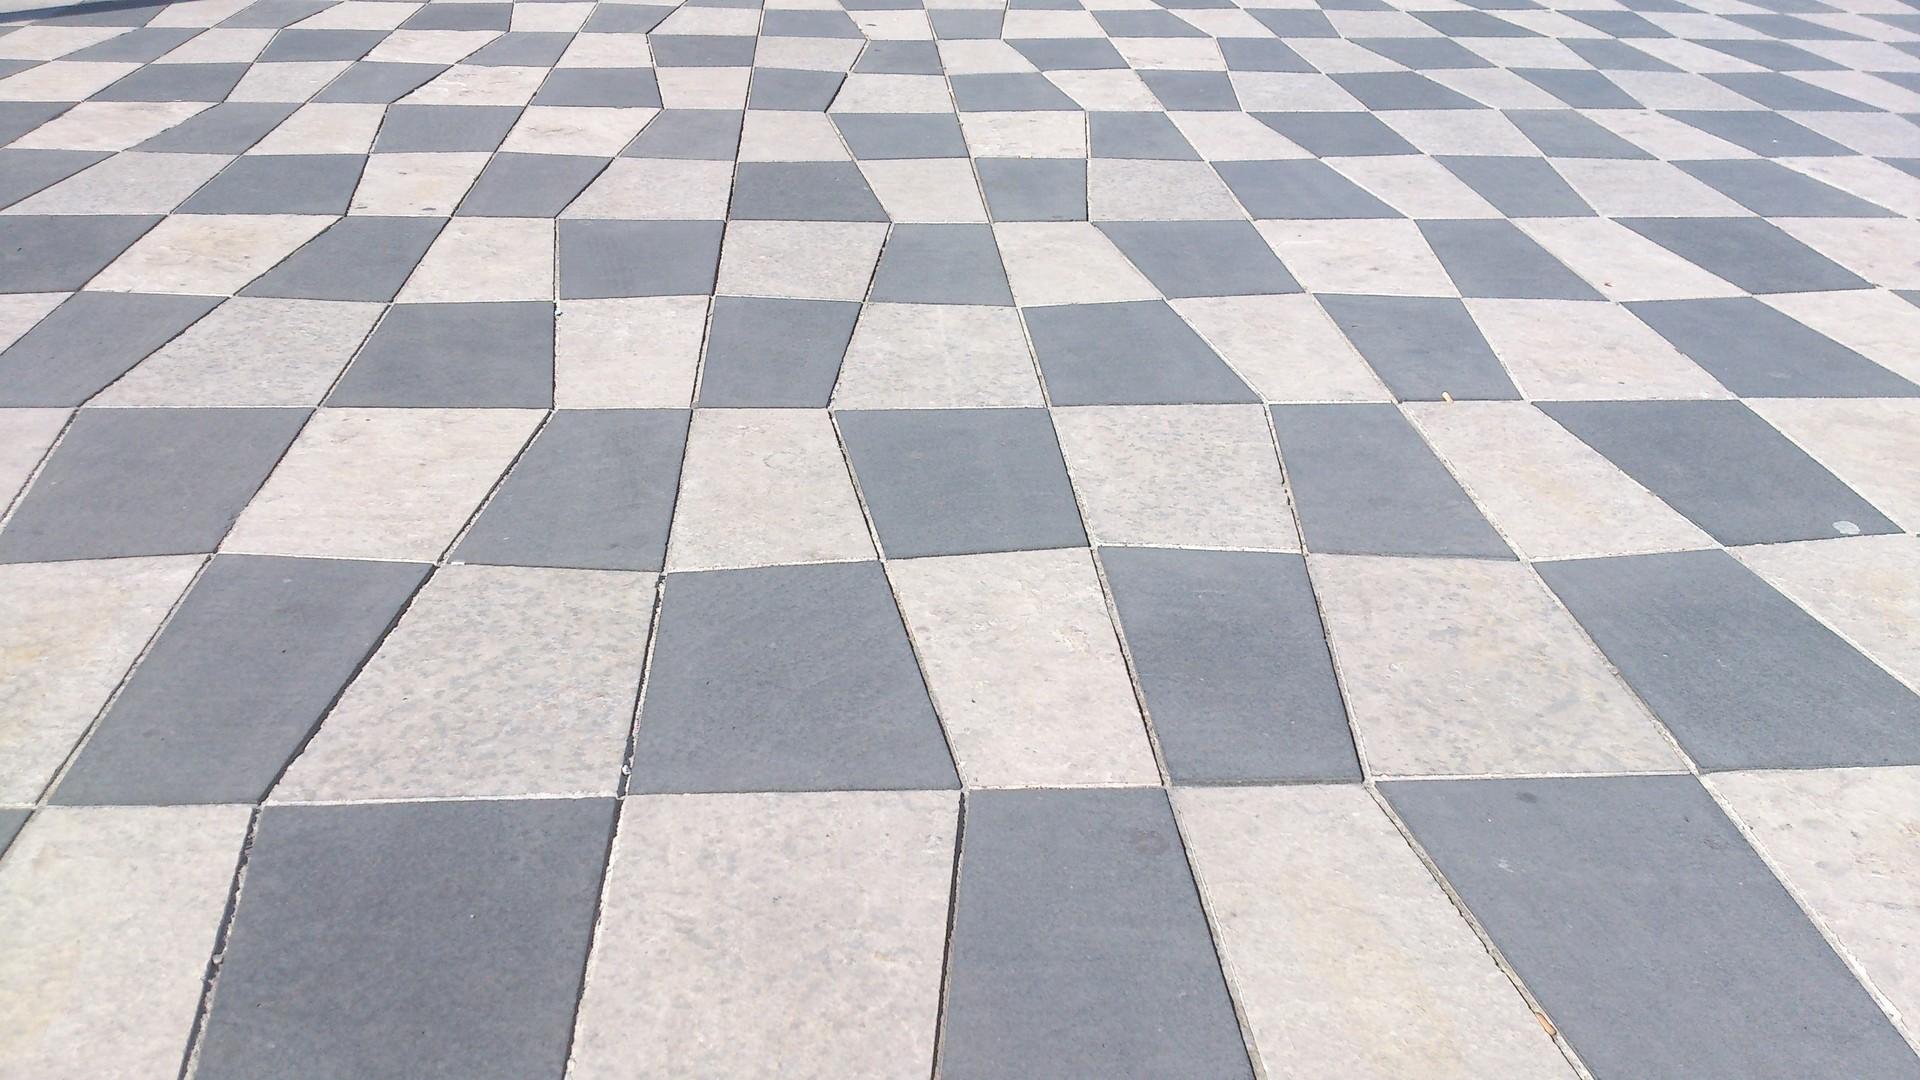 pavimento place massena nizza